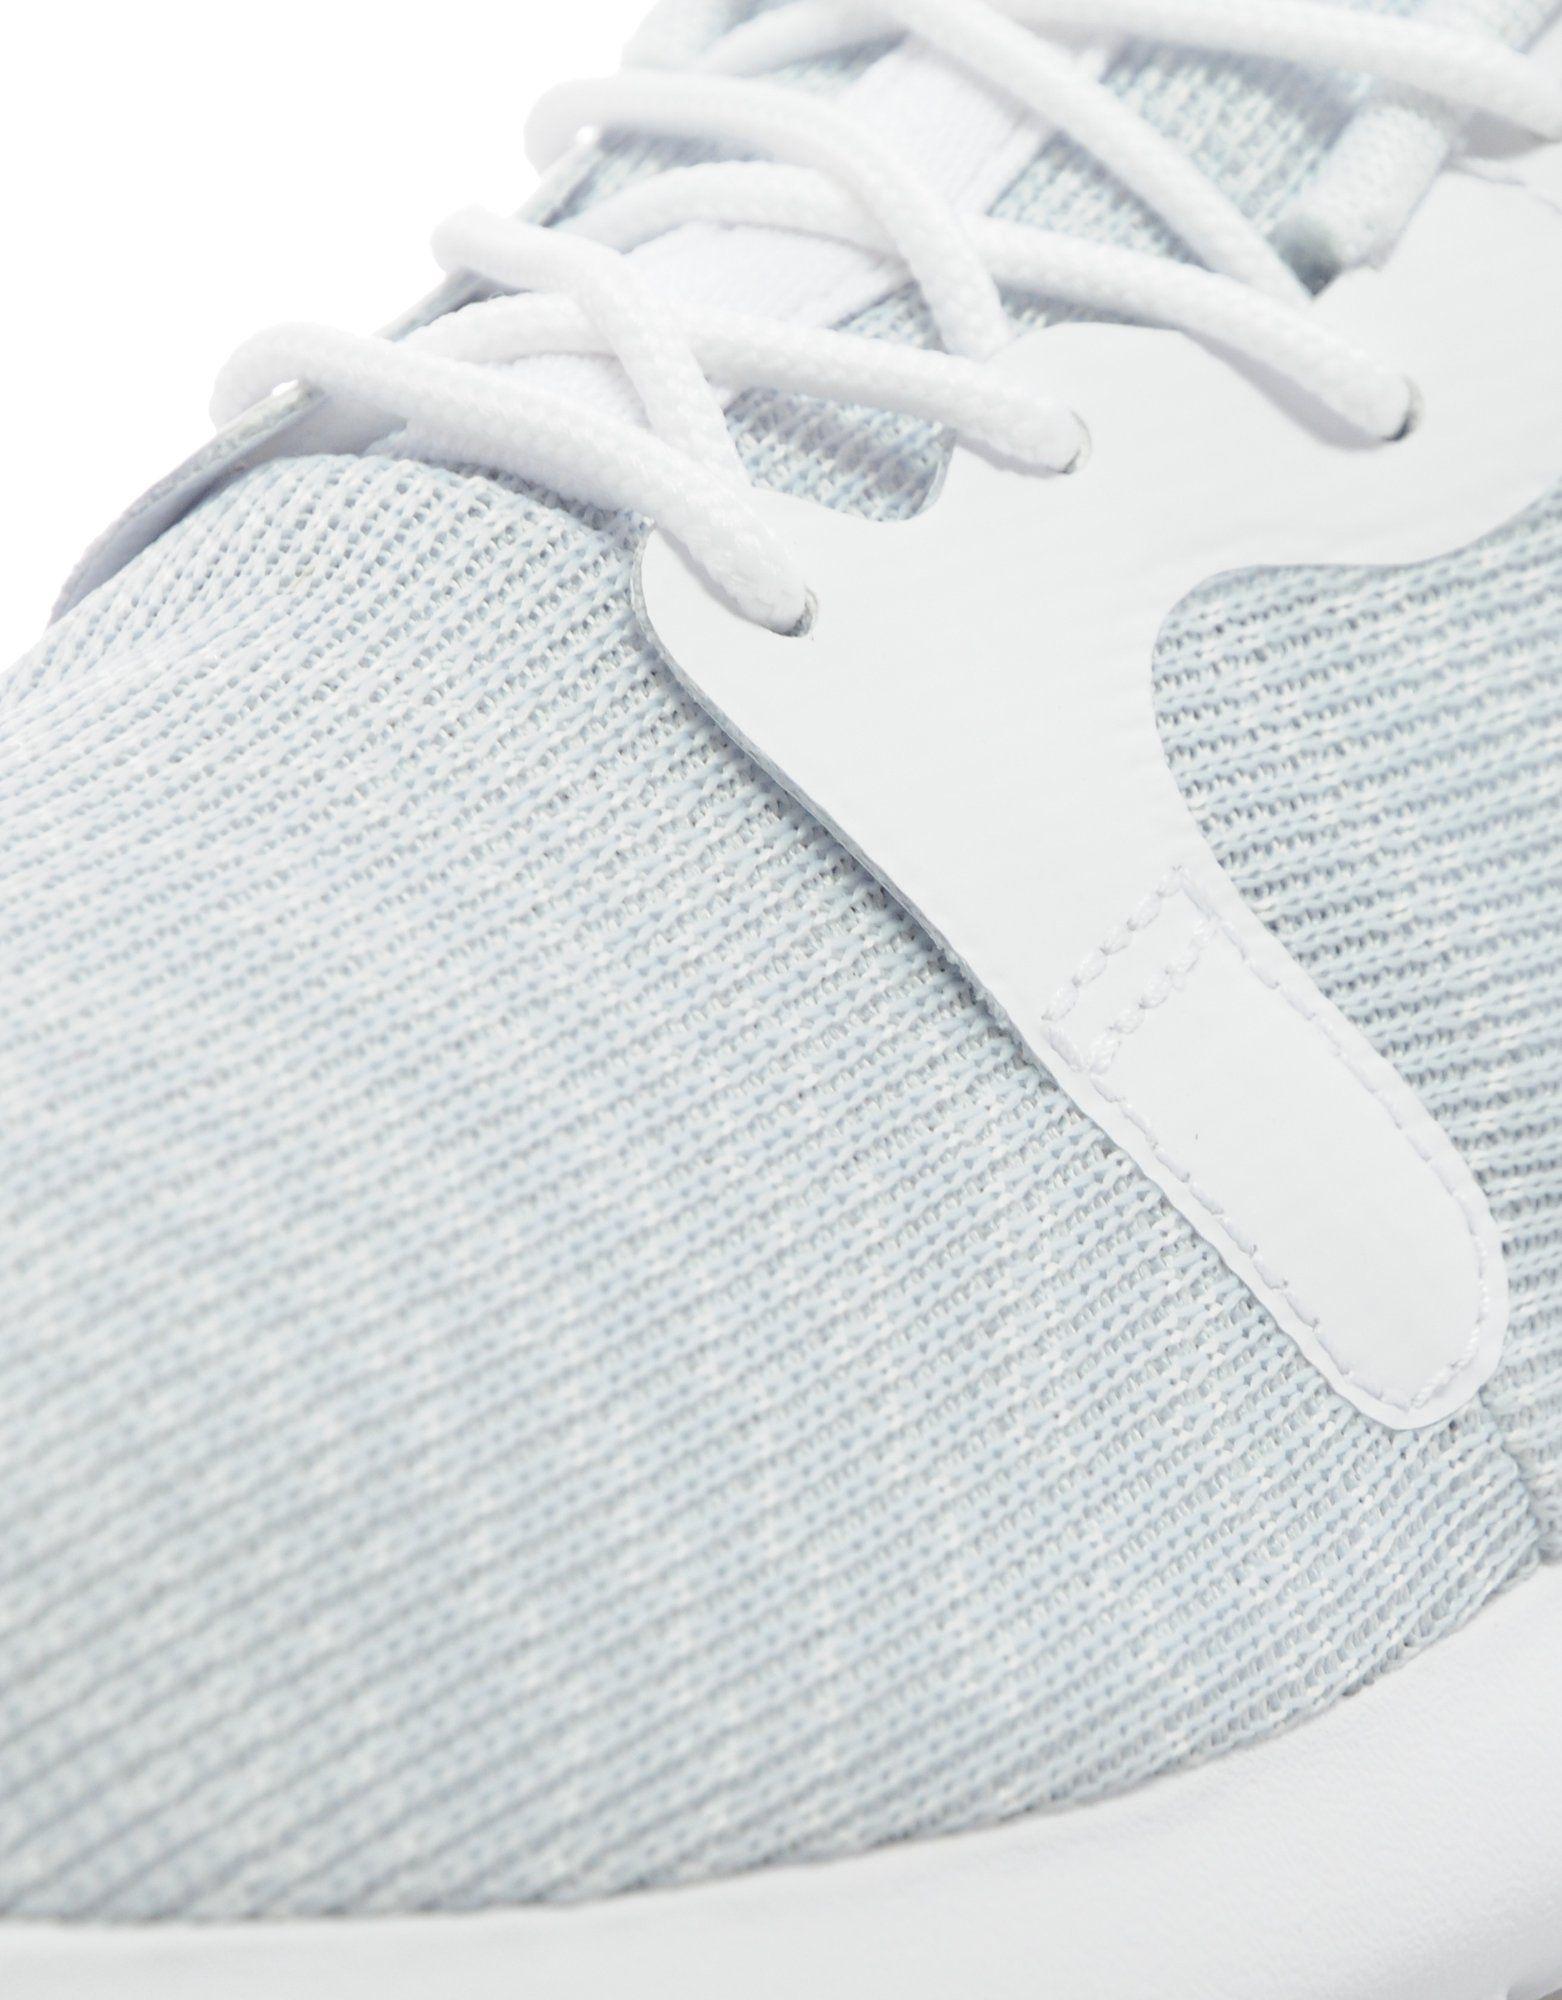 bdtdh Nike Roshe One Jacquard Knit | JD Sports